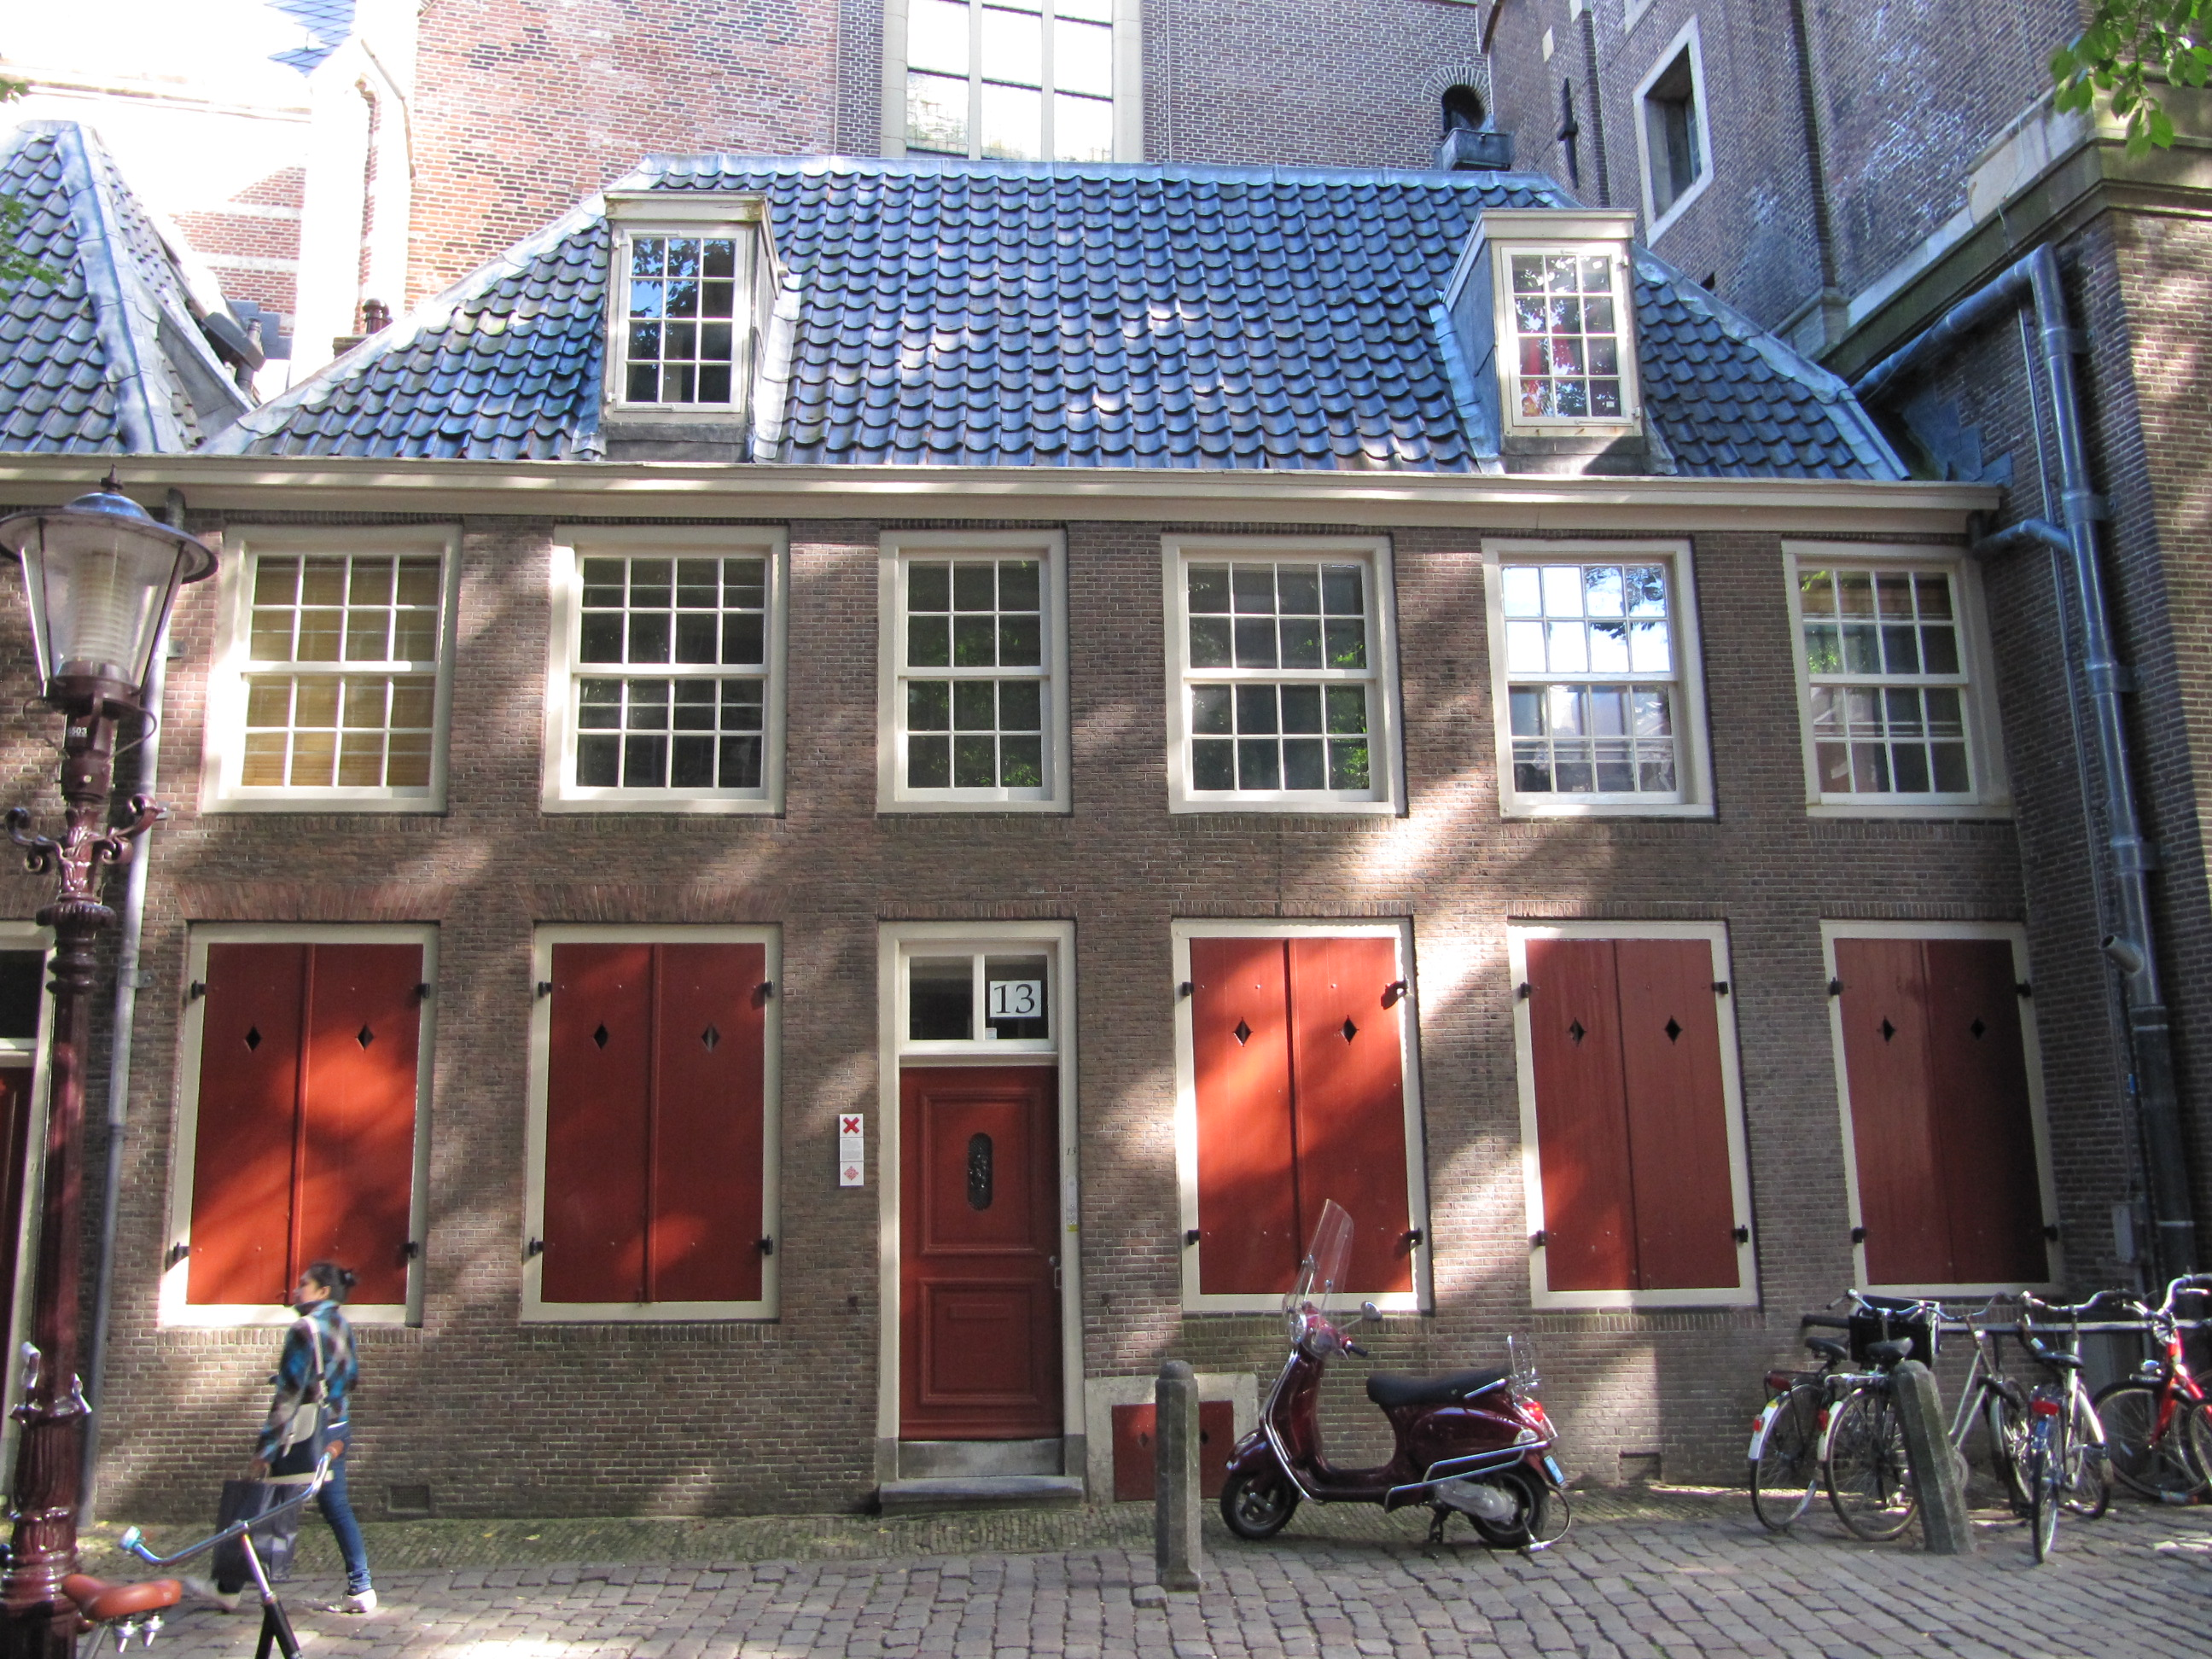 File:RM3989 Amsterdam - Oudekerksplein 13.jpg